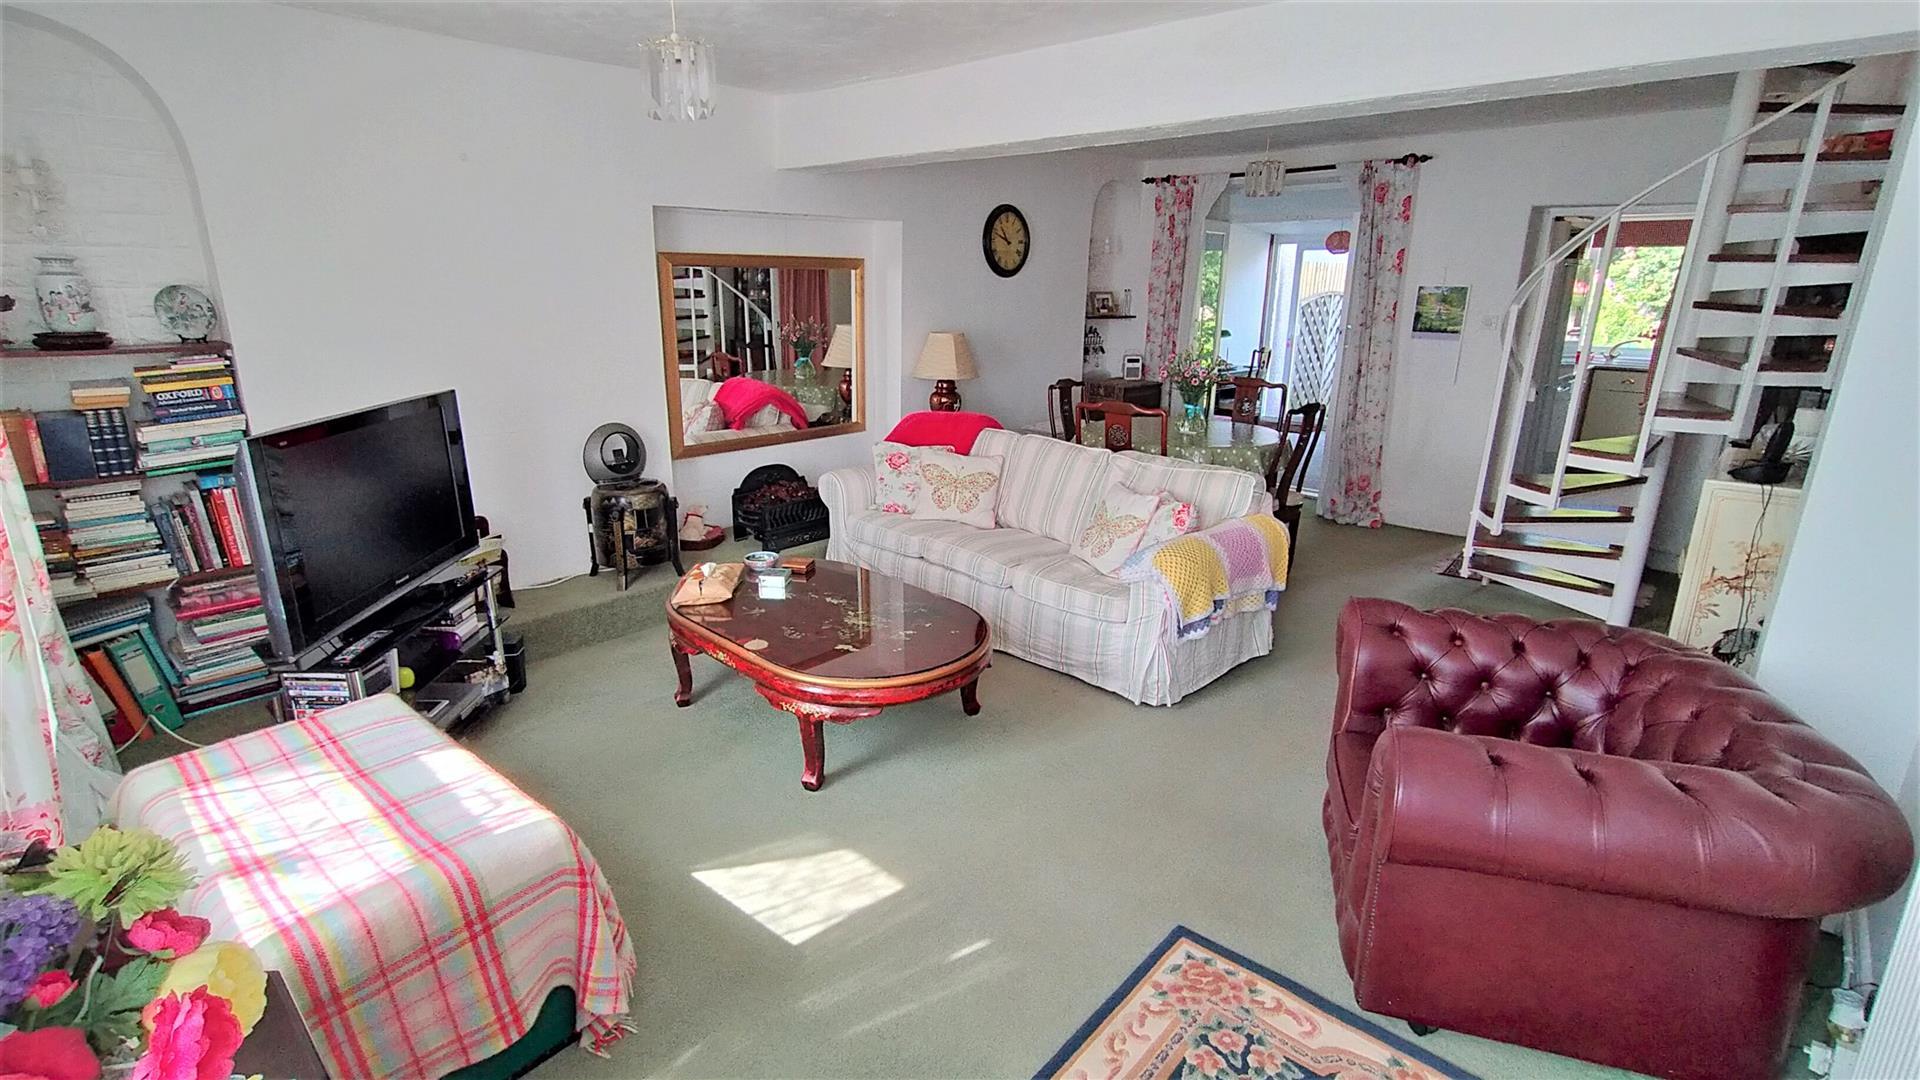 Mumbles Road, Blackpill, Swansea, SA3 5AS